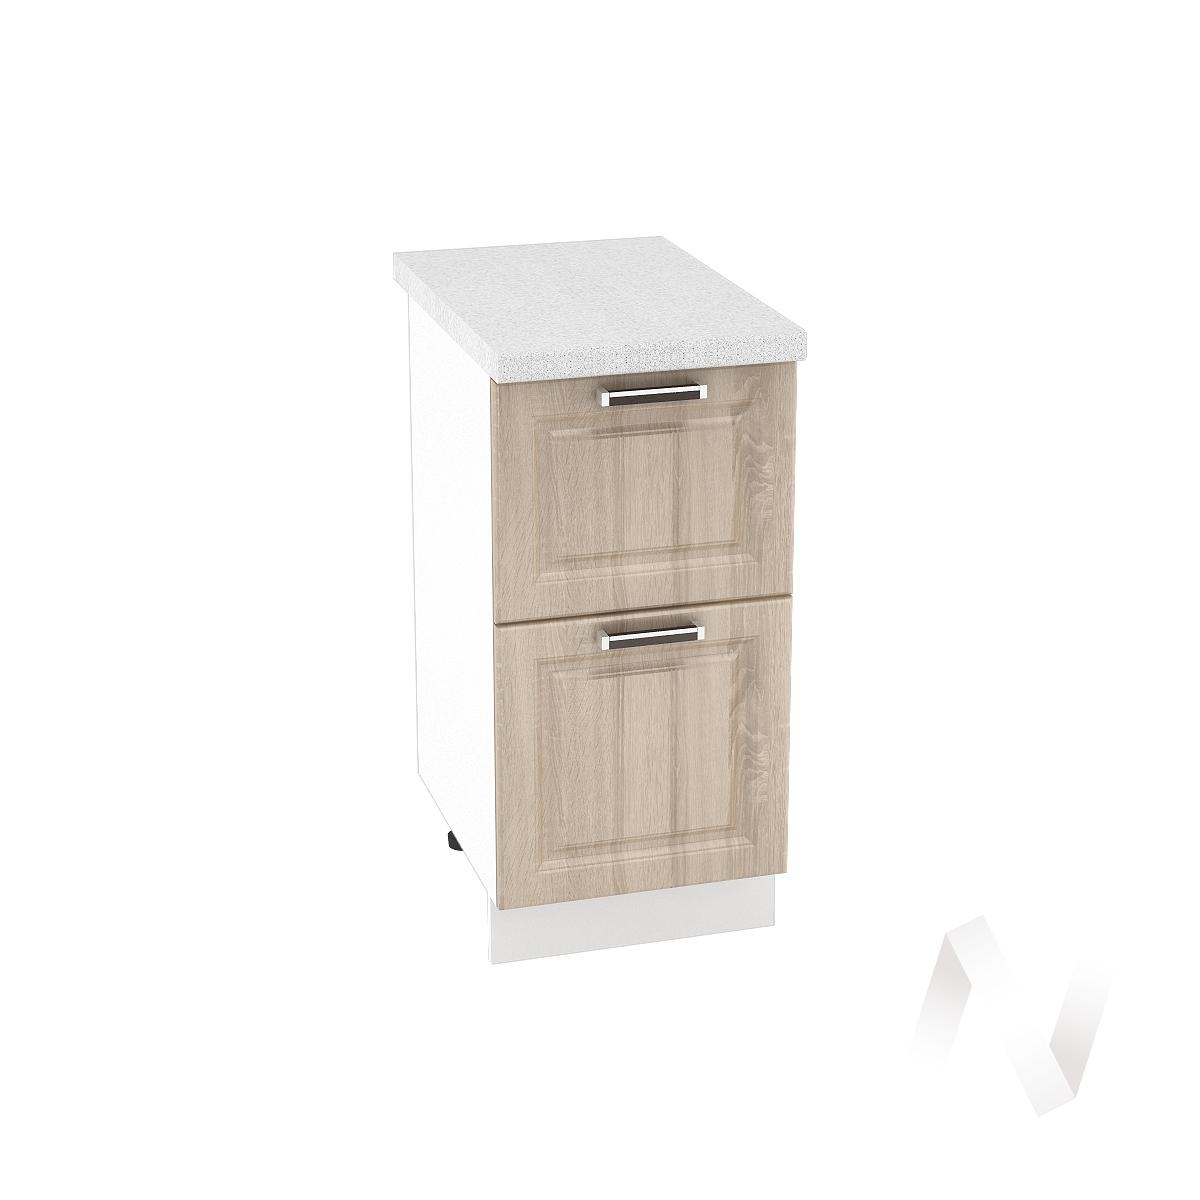 "Кухня ""Прага"": Шкаф нижний с 2-мя ящиками 400, ШН2Я 400 (дуб сонома/корпус белый)"